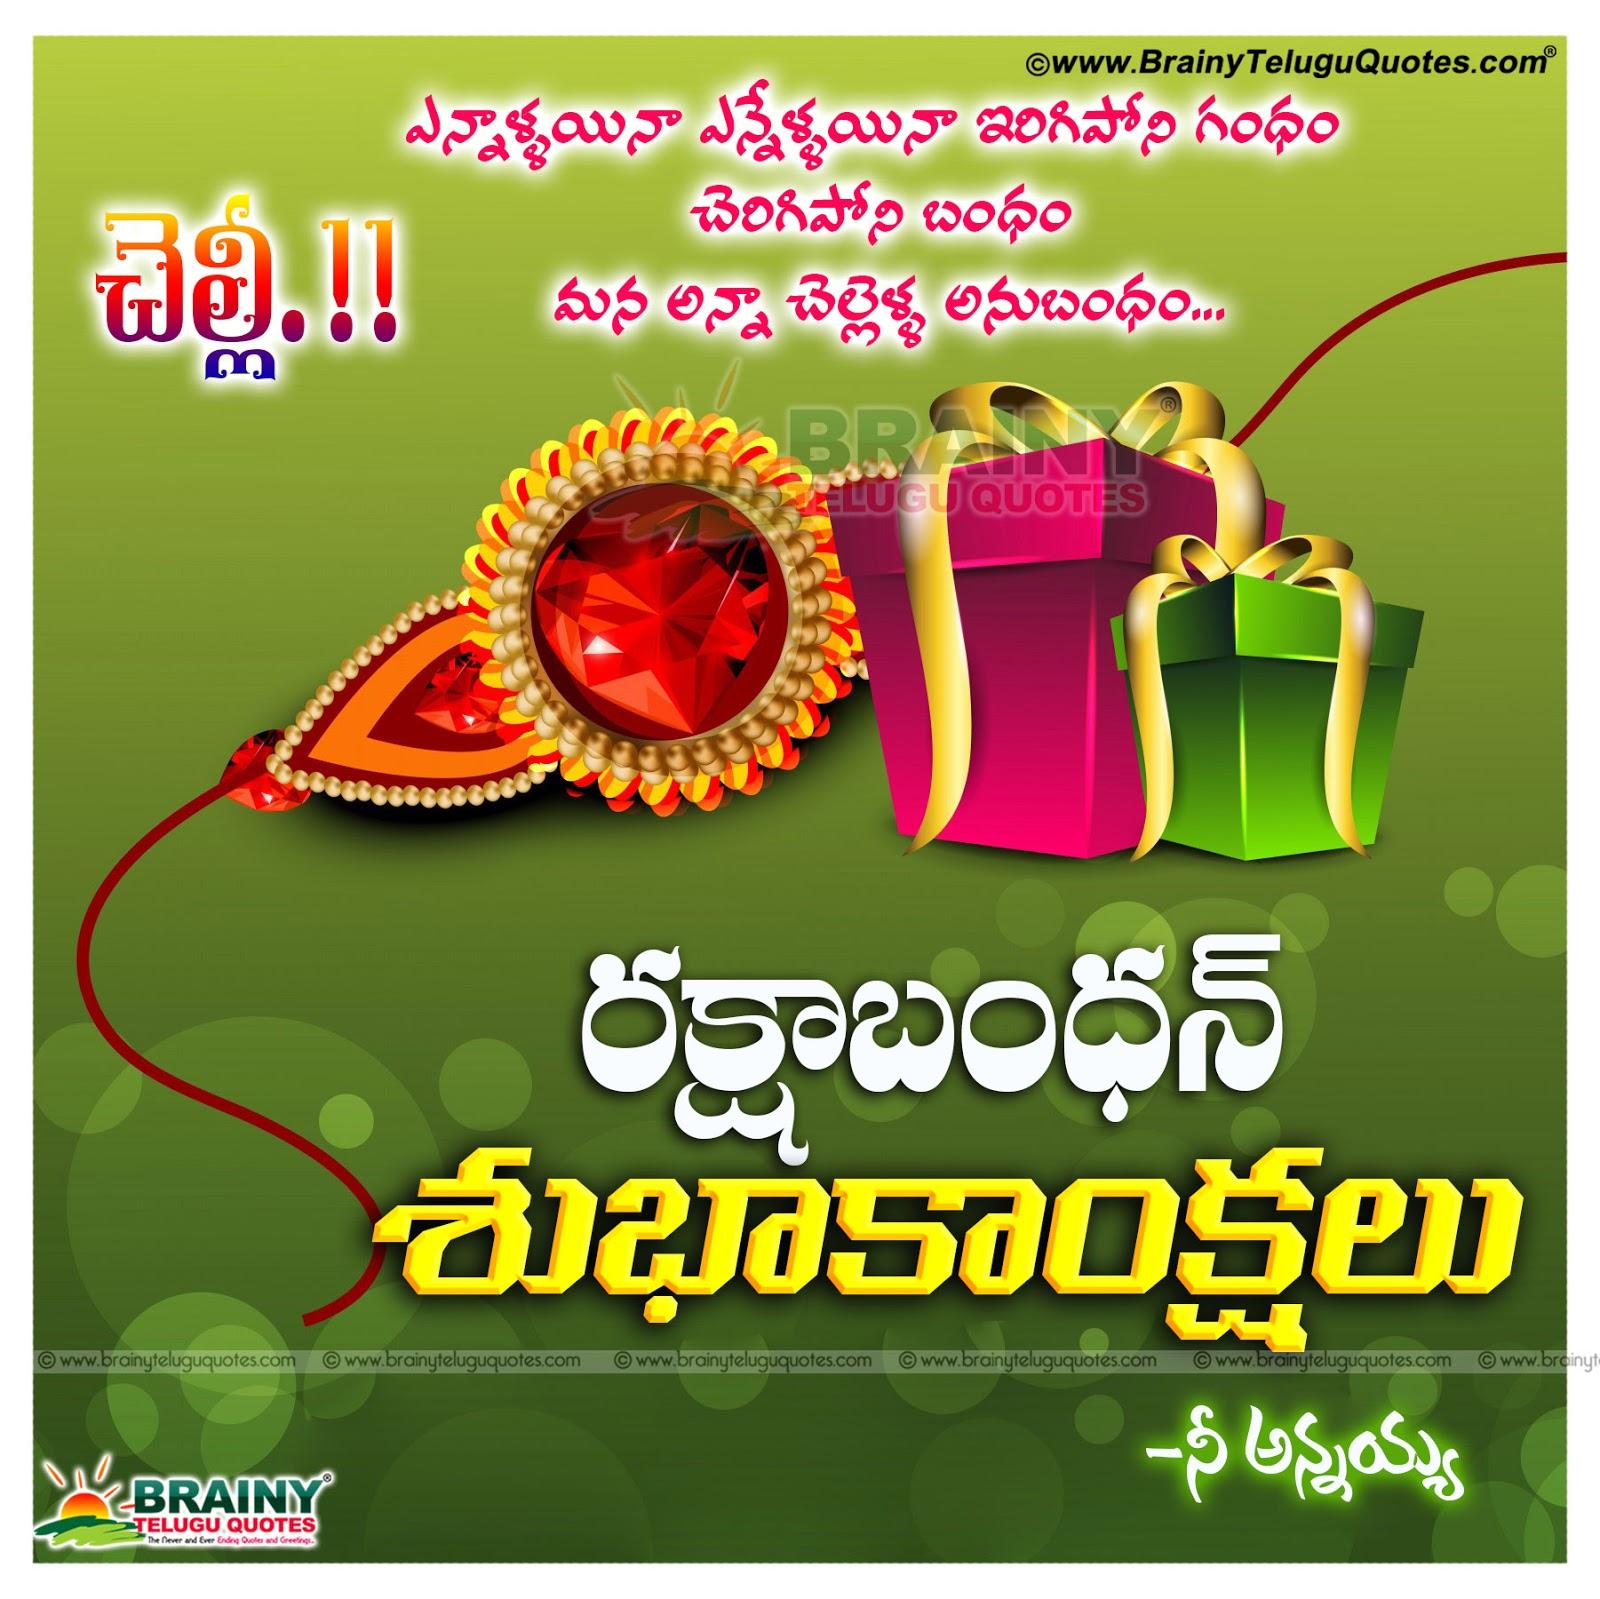 Funny Quotes For Brother In Hindi: Telugu Rakhi Quotes And Raksha Bandhan Best Greetings